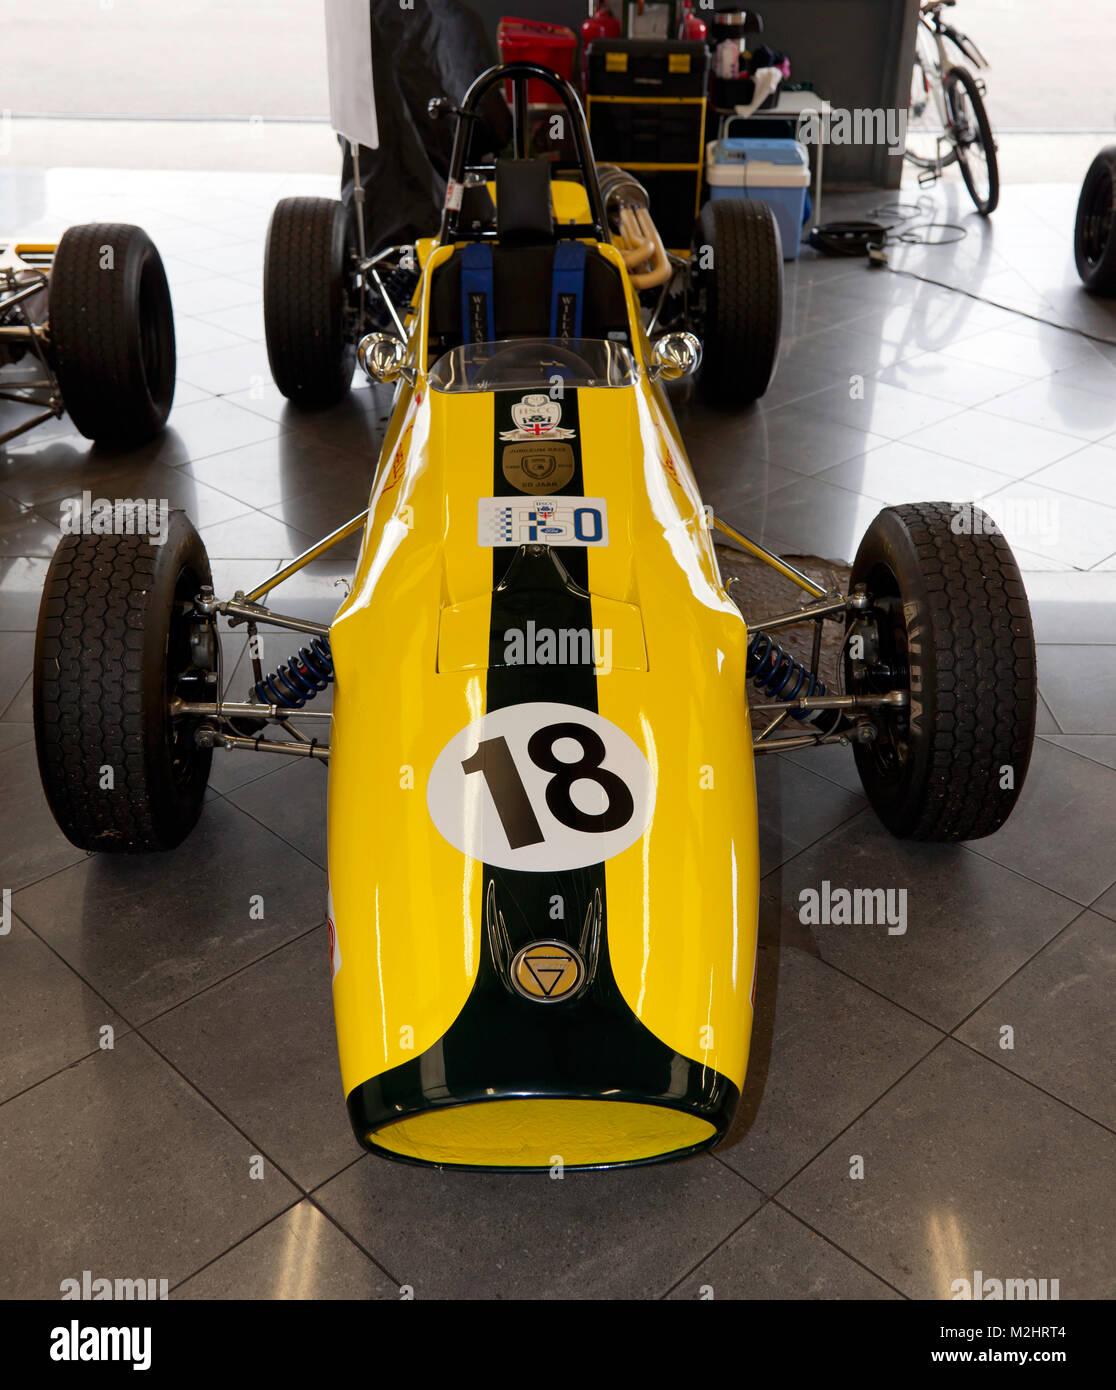 Ginetta race car stock photos ginetta race car stock for National motor club compensation plan